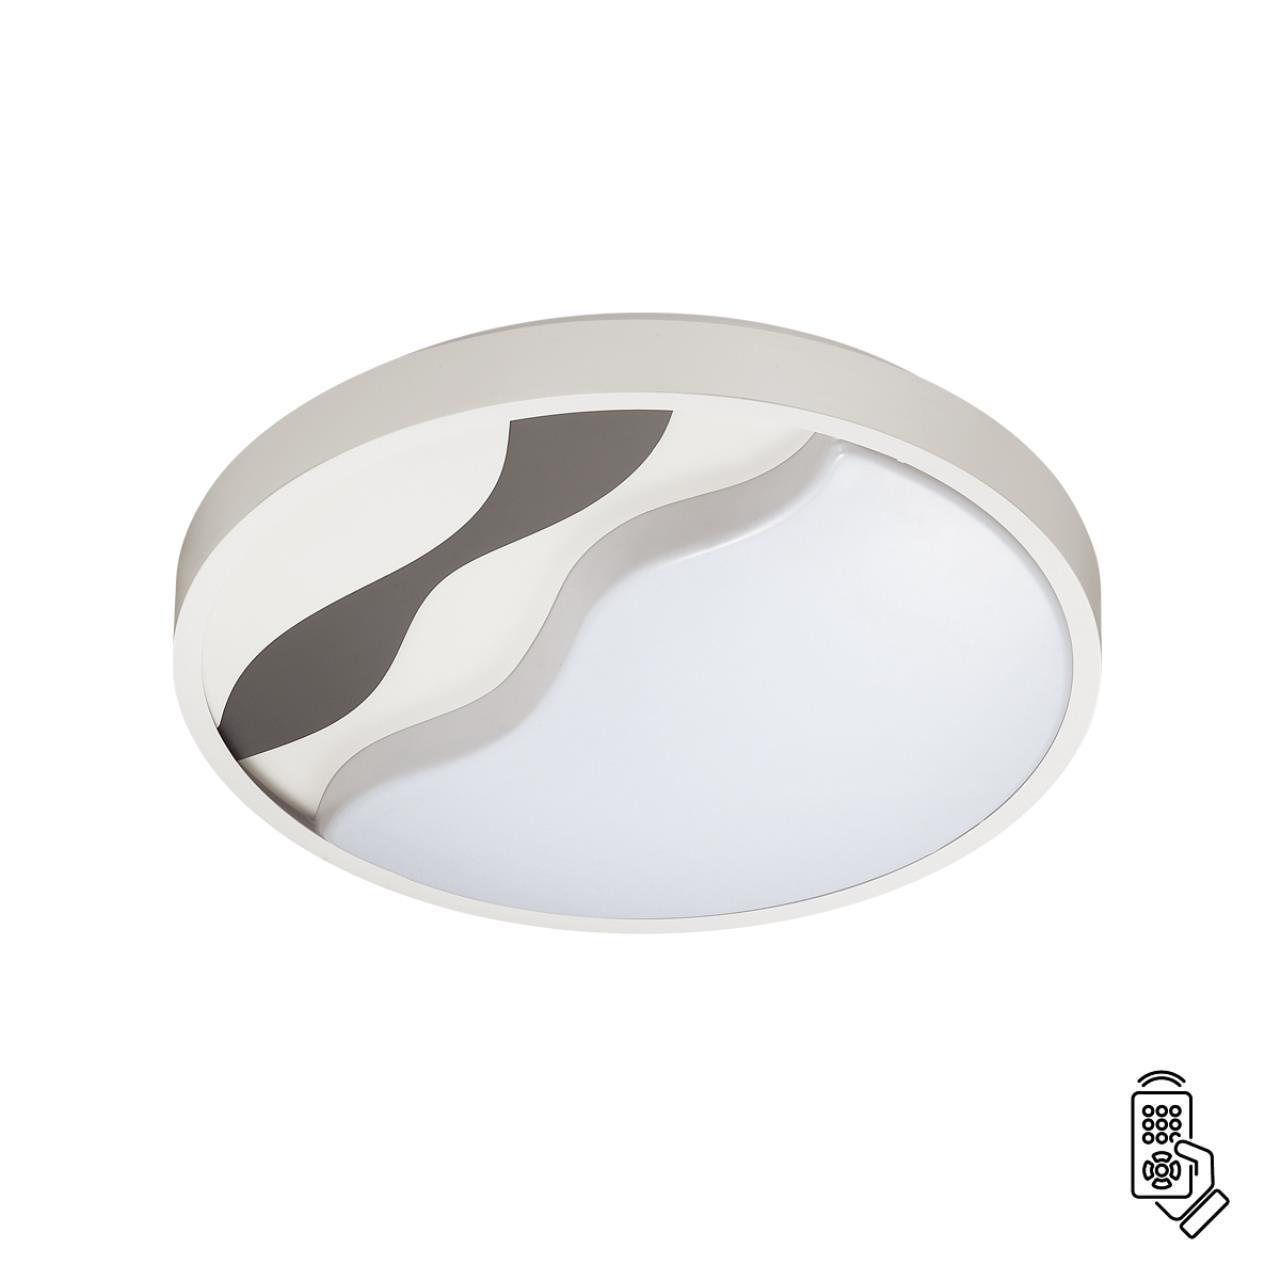 Н/п светильник LUMION NALU 4500/72CL